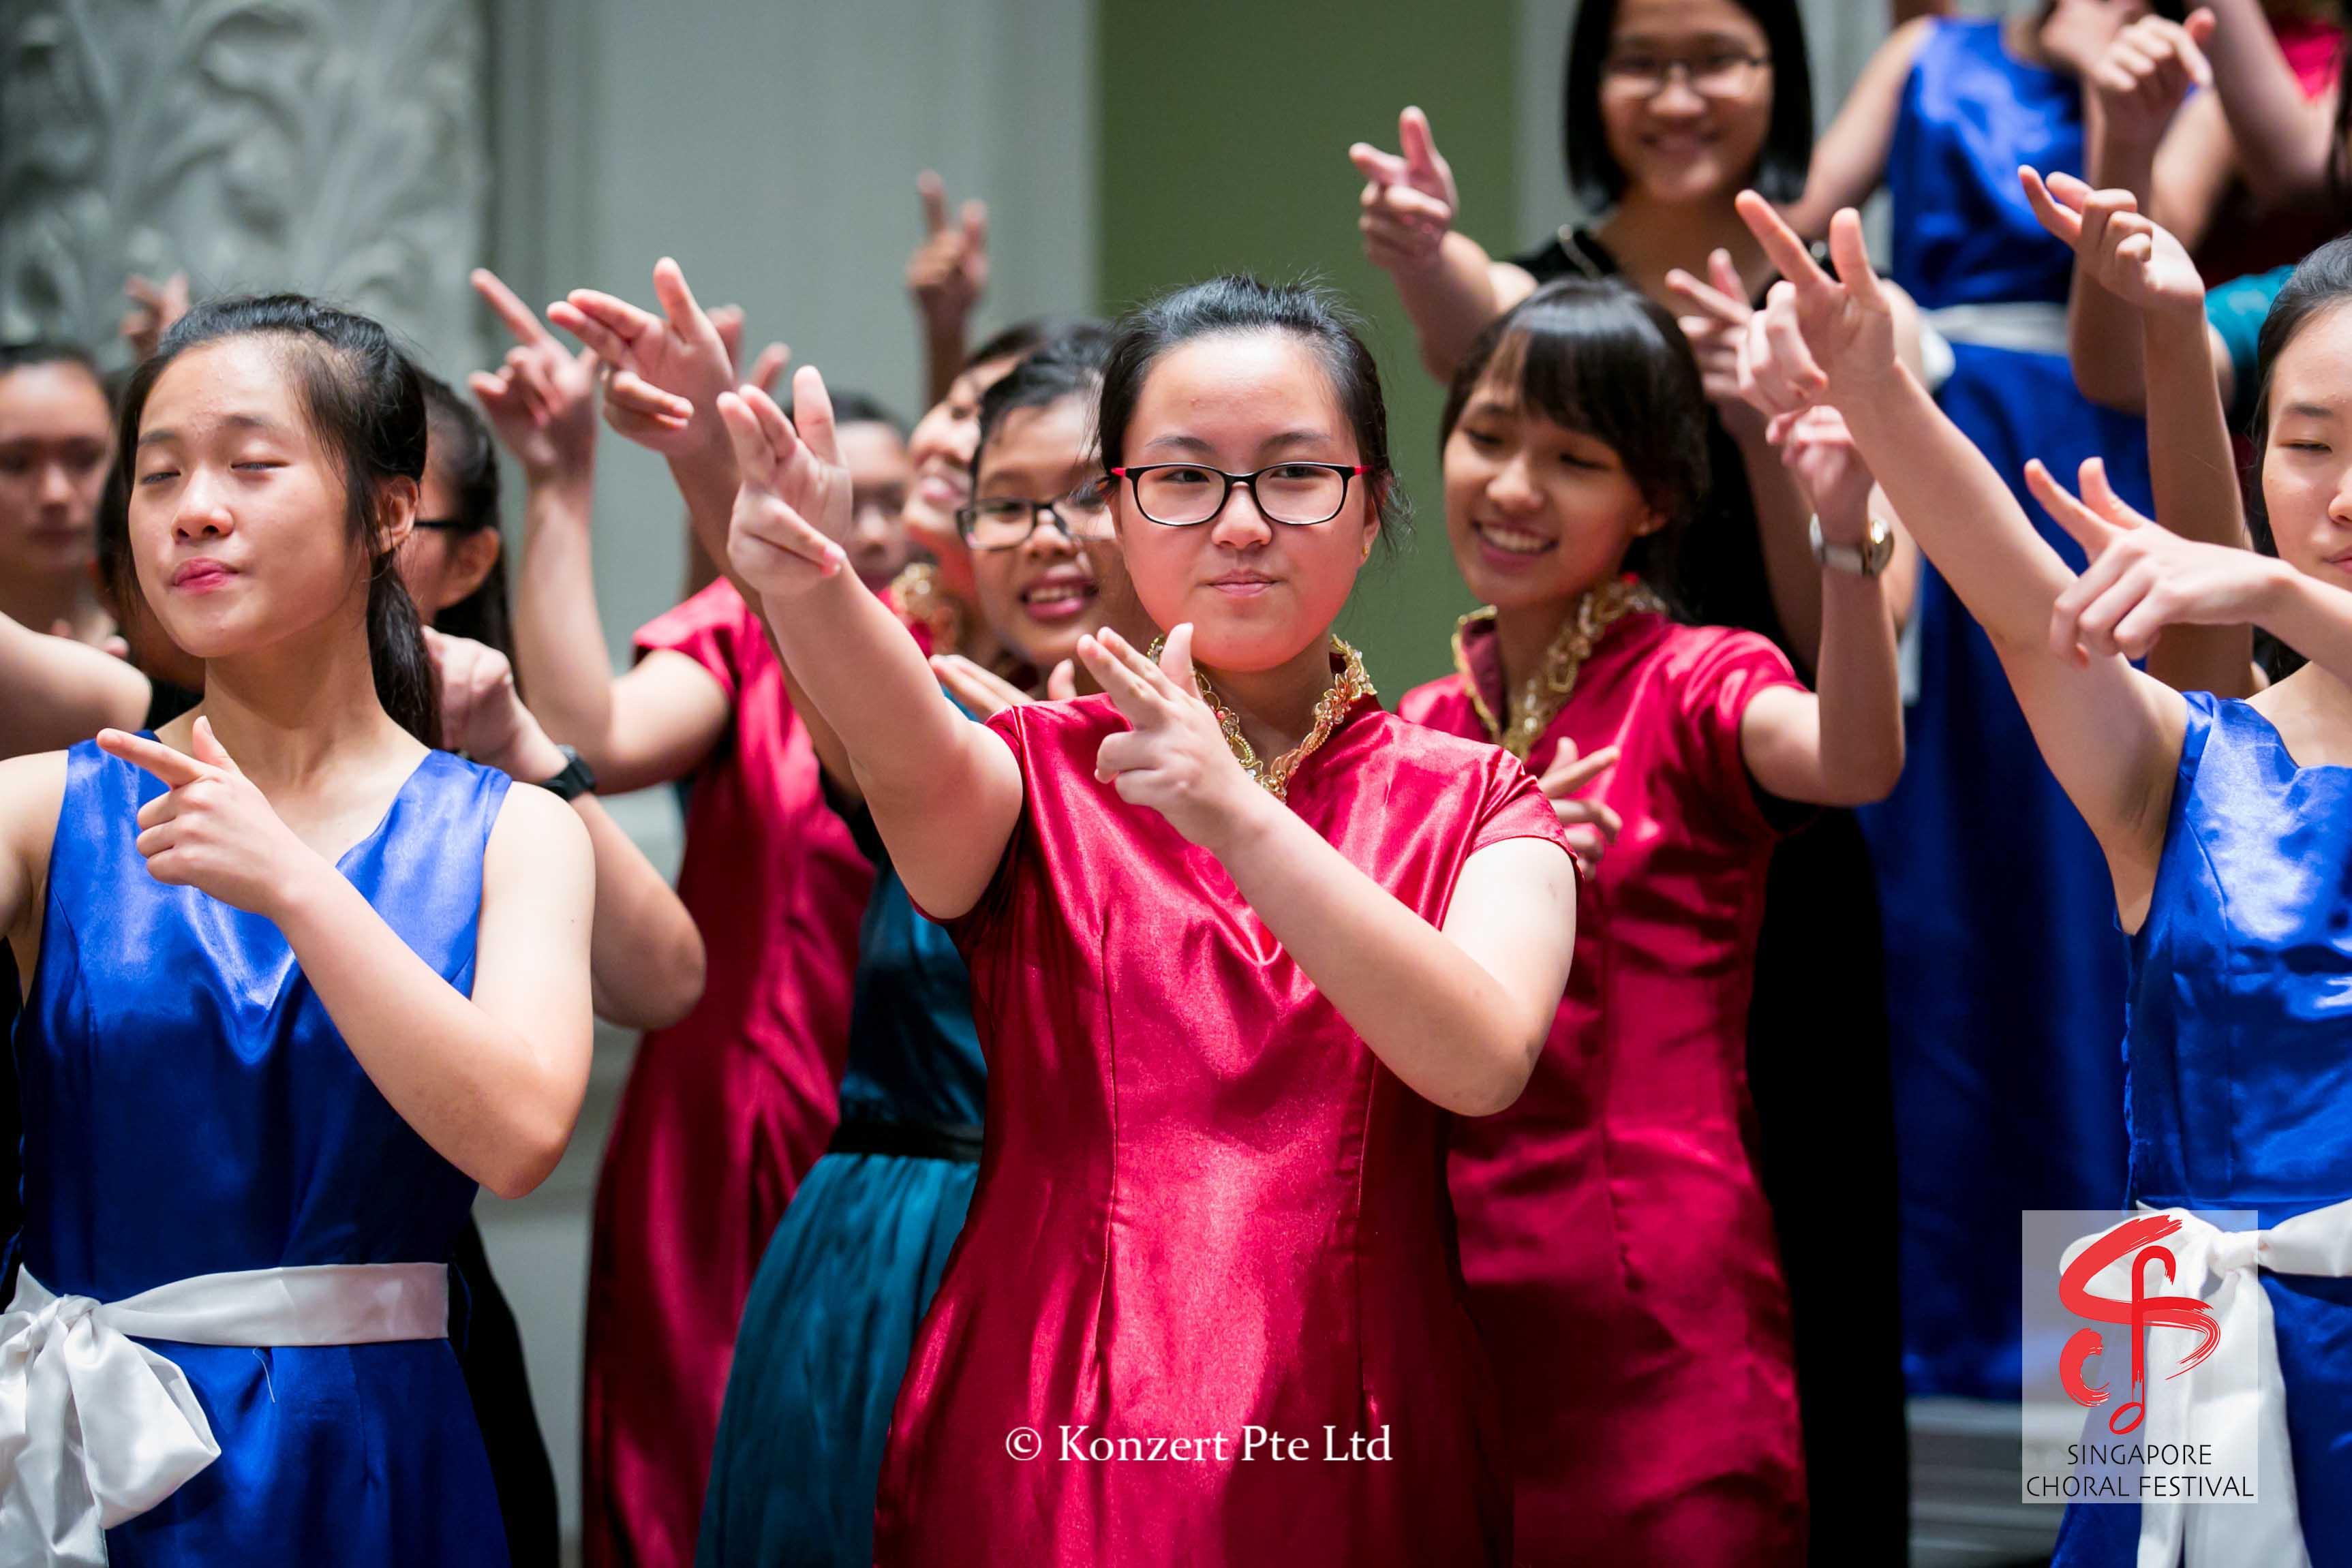 Singapore Choral Festival 7-8-15 (167).jpg